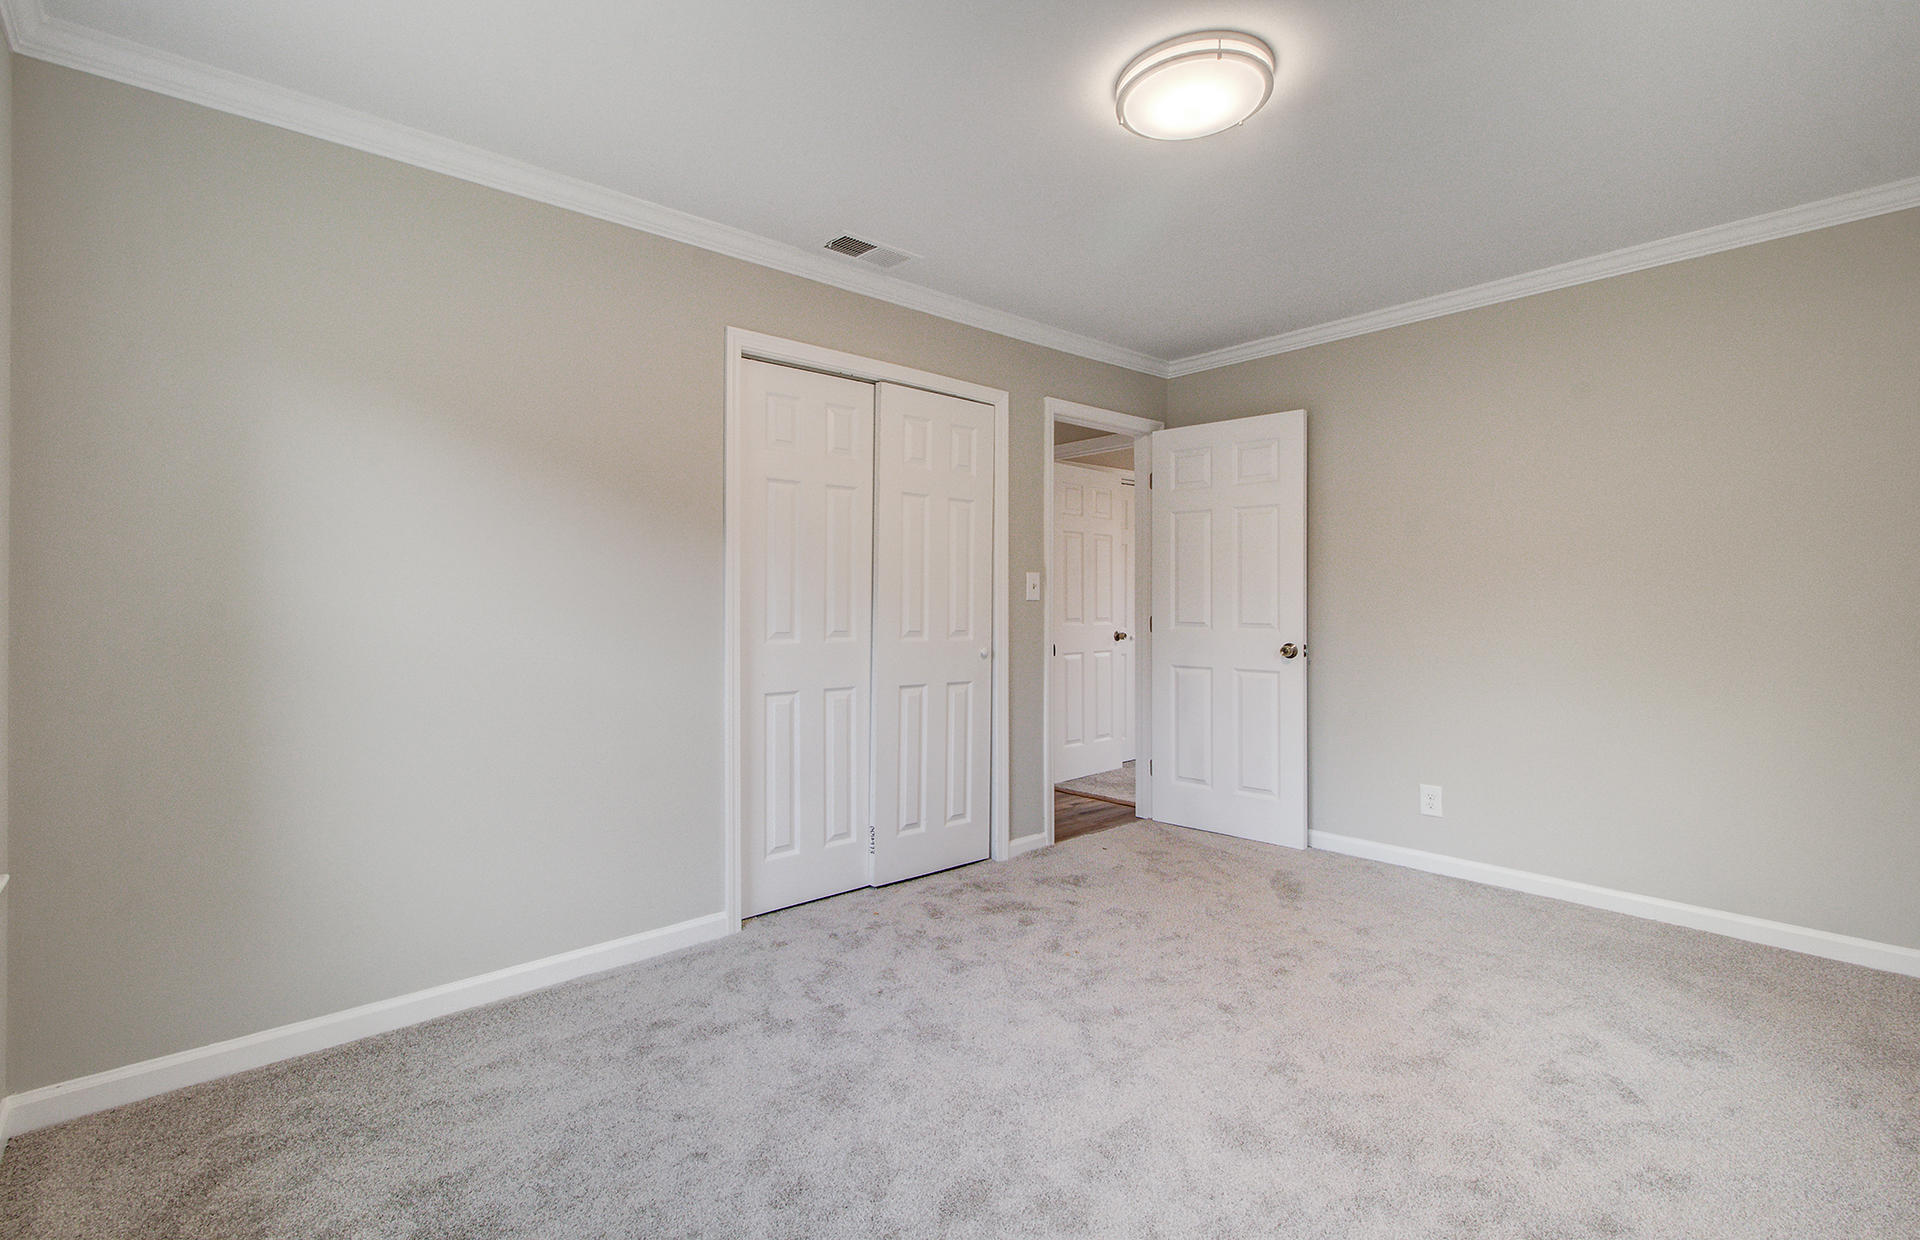 Sedgefield Section I Homes For Sale - 30 Aldene, Goose Creek, SC - 0